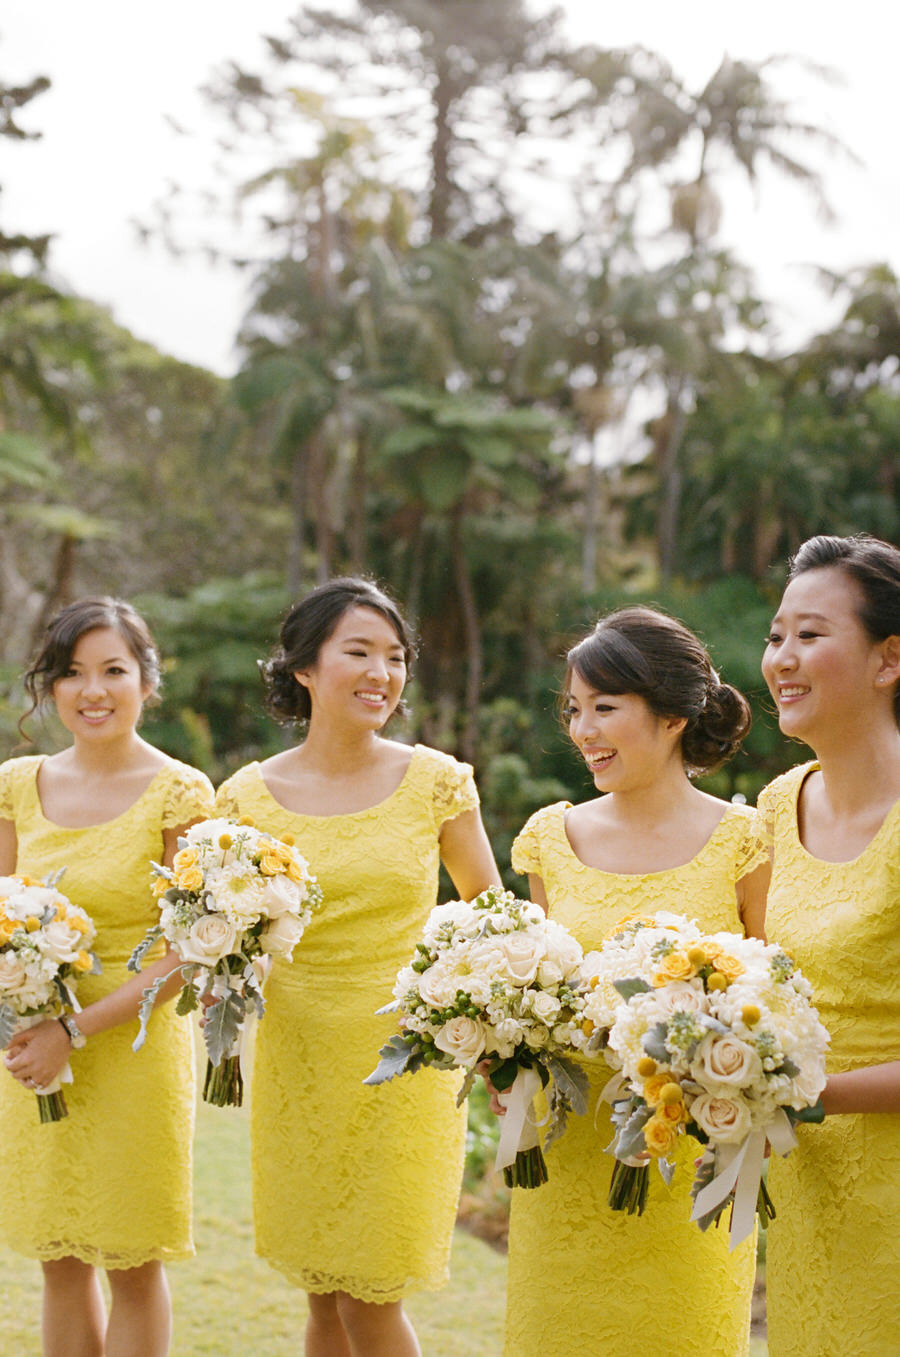 Lace Yellow Bridesmaids: fabmood.com